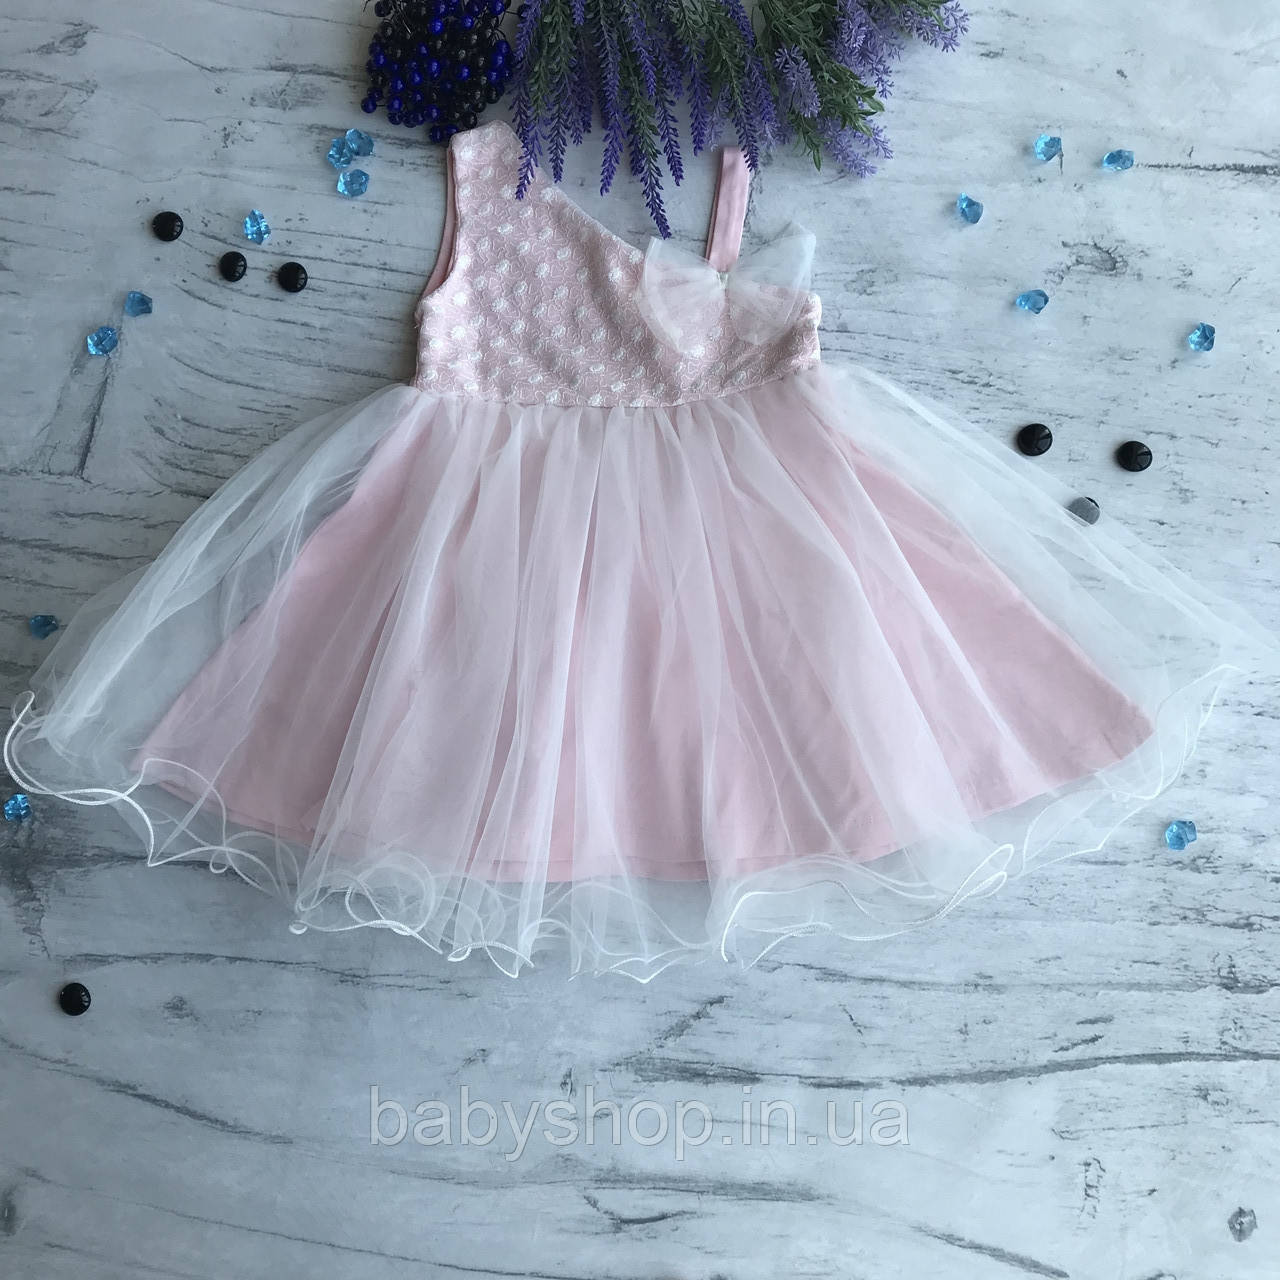 Платье Breeze 312. Размер 98, 104, 110, 116, 128 см